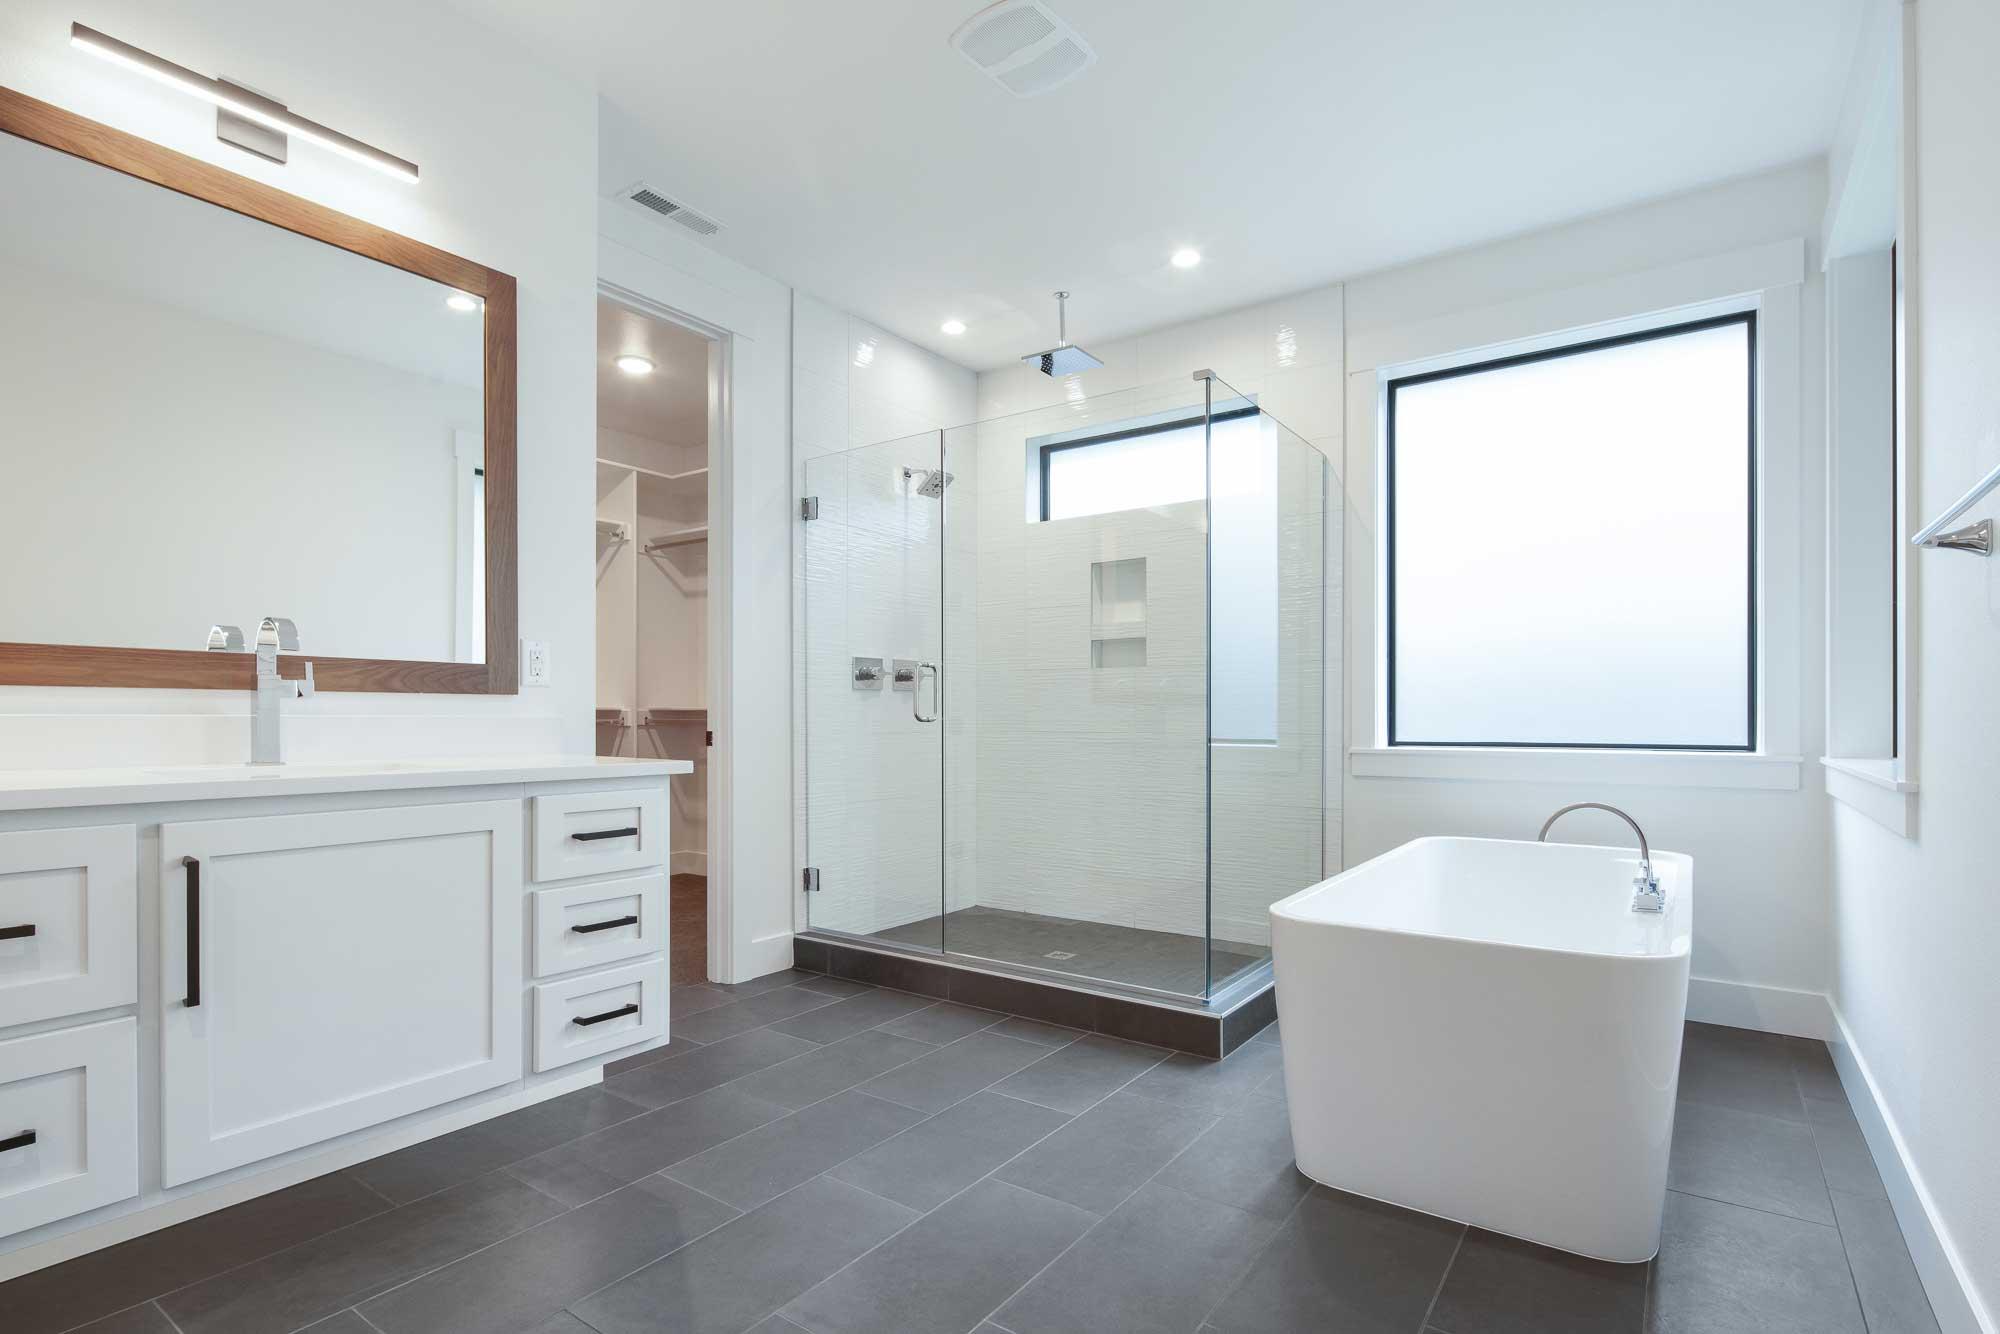 Gallery-Bathrooms-Kingston-06-11-21-124